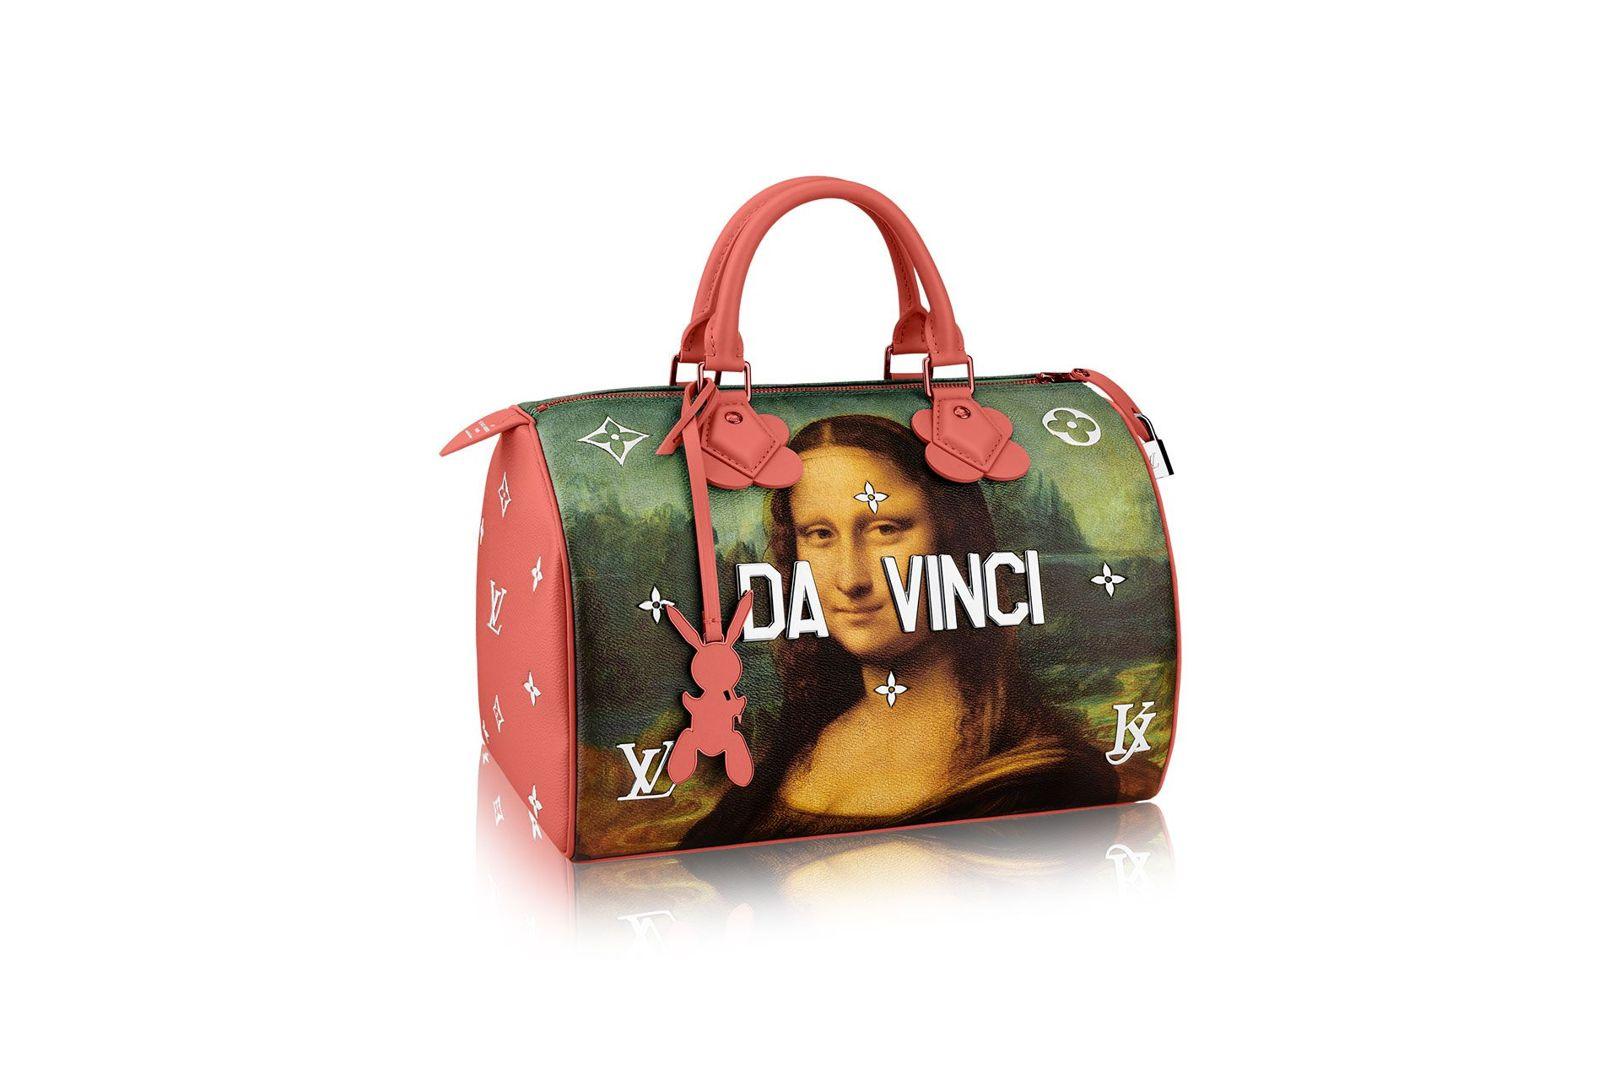 Jeff Koons collaboration with Louis Vuitton, Mona Lisa (by Leonardo da Vinci) bag series